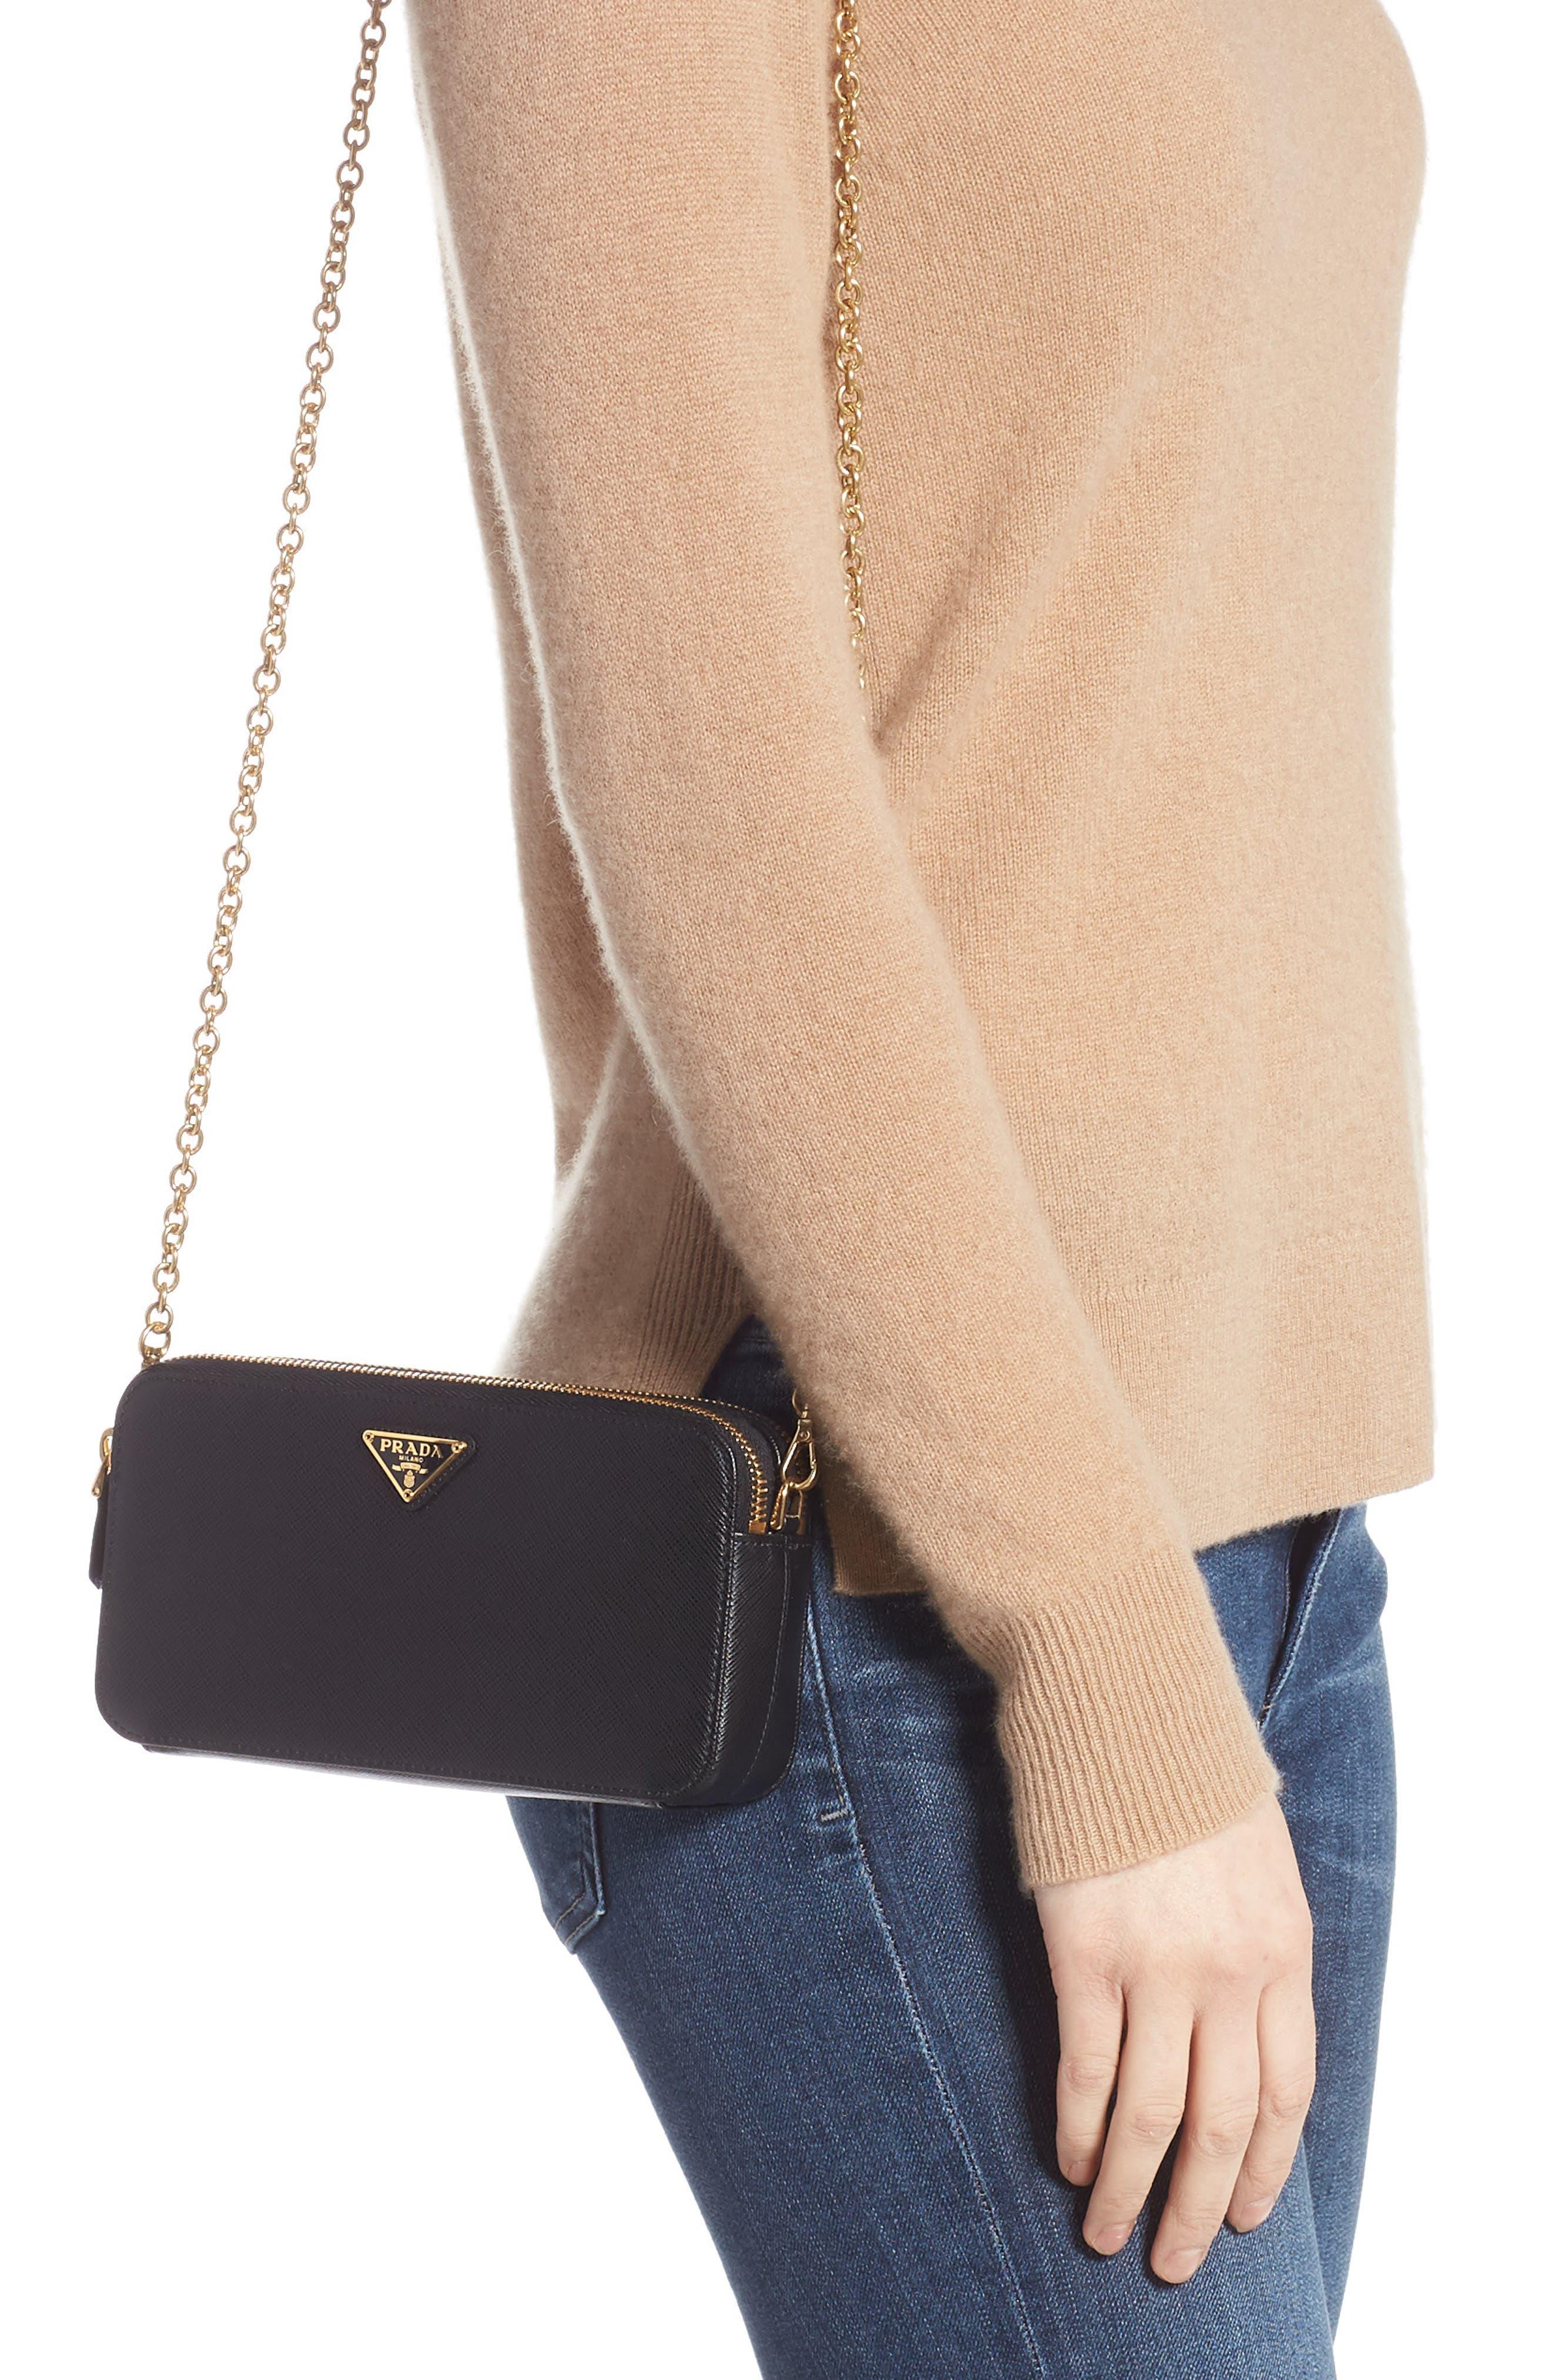 Small Double Compartment Zip Saffiano Leather Crossbody Bag,                             Alternate thumbnail 2, color,                             NERO